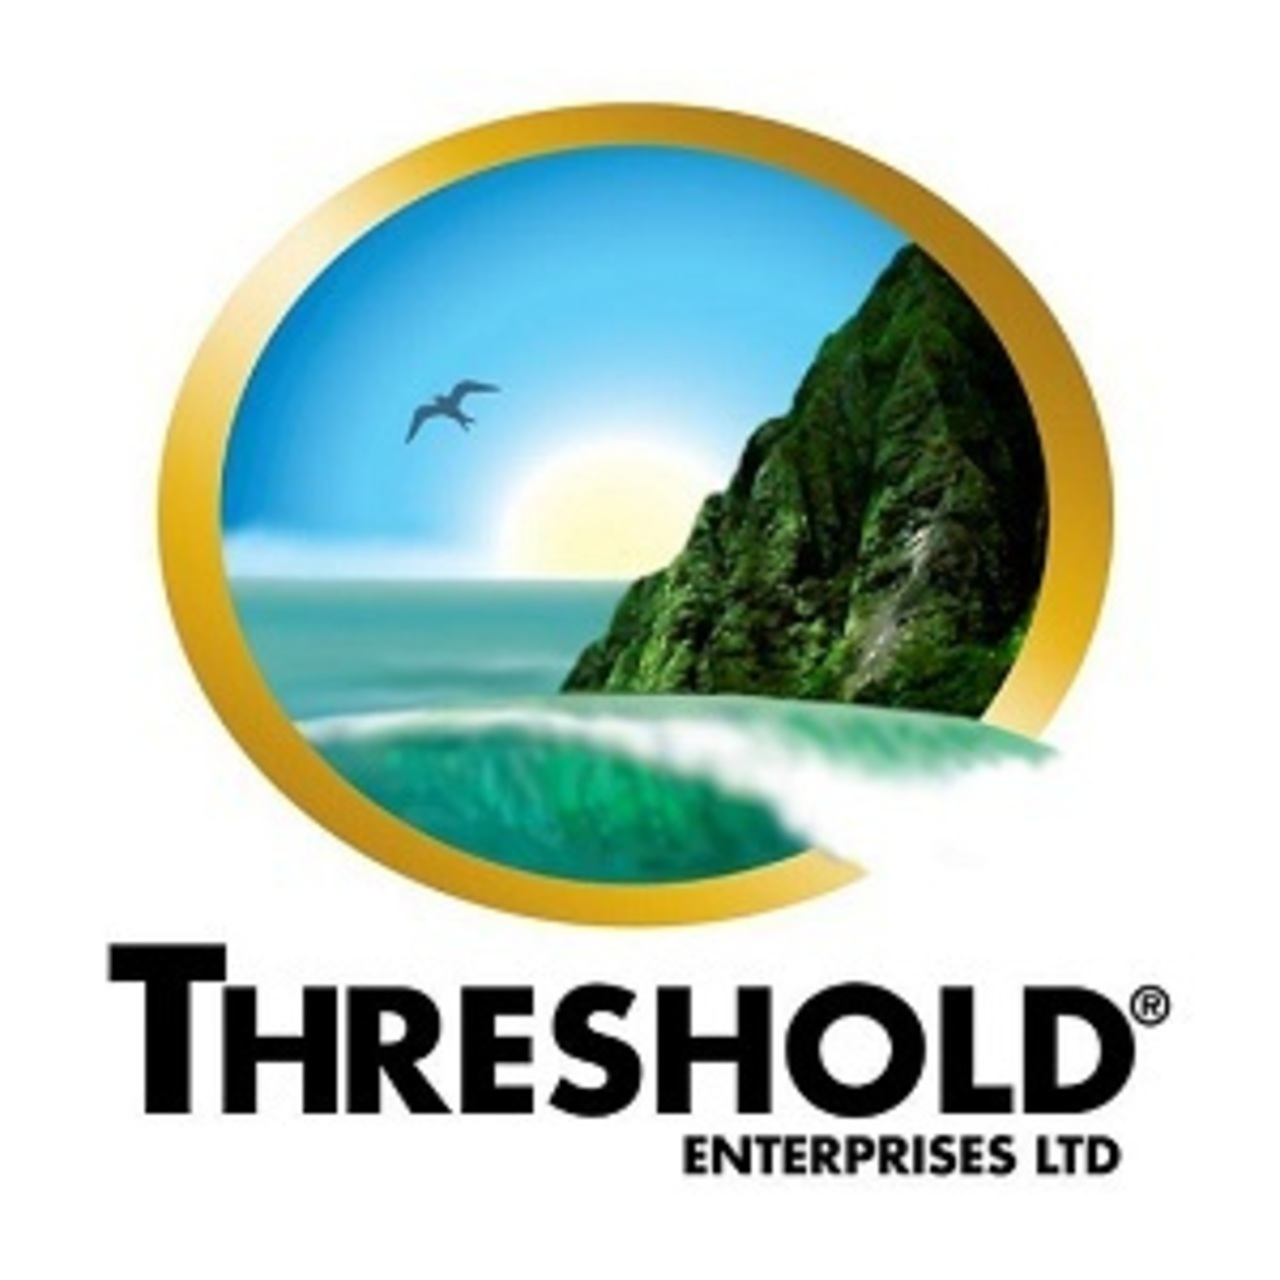 Threshold Heroes